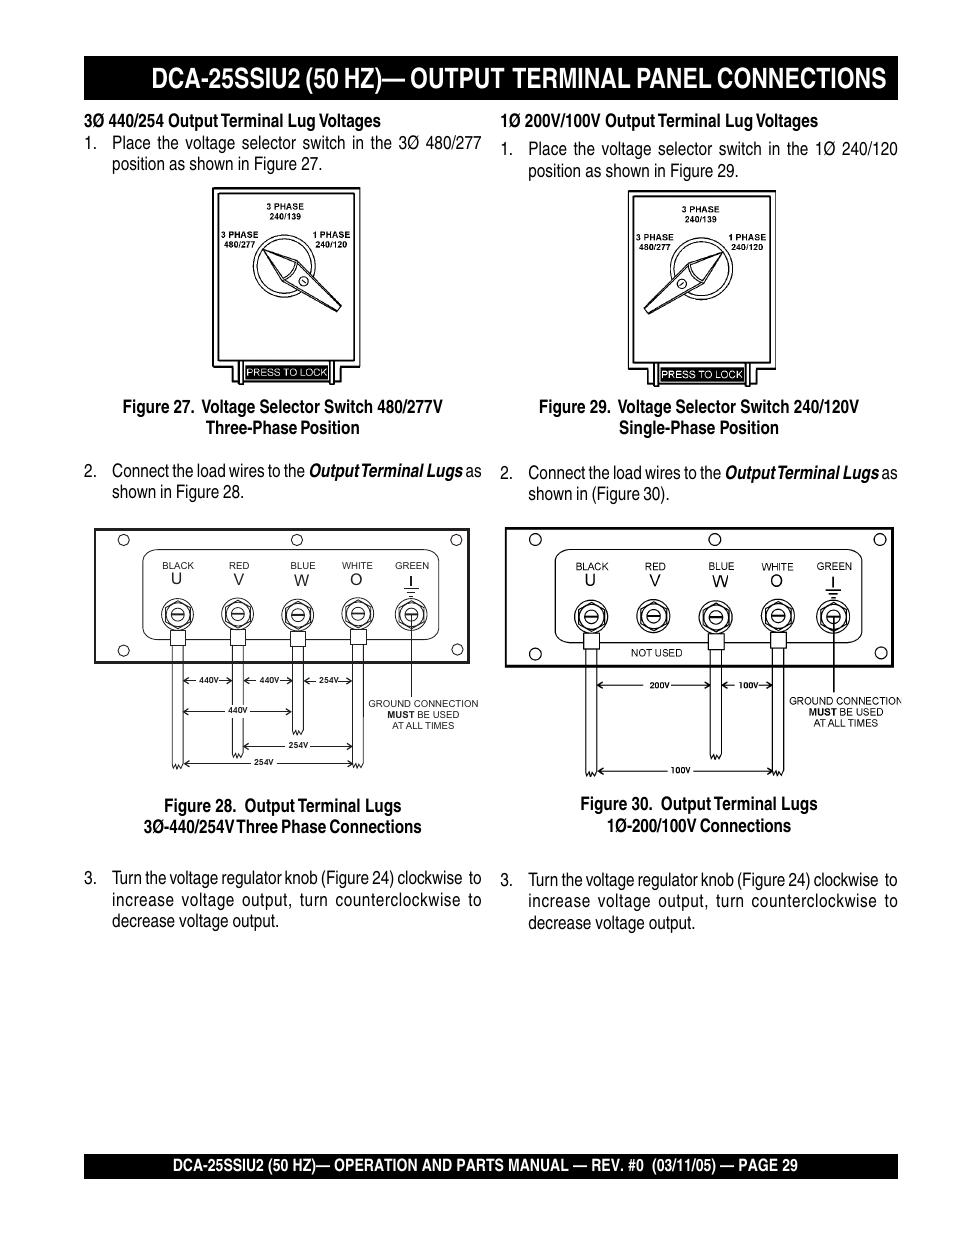 medium resolution of multiquip mq power whisperwatt 50 hz generator dca 25ssiu2 user manual page 29